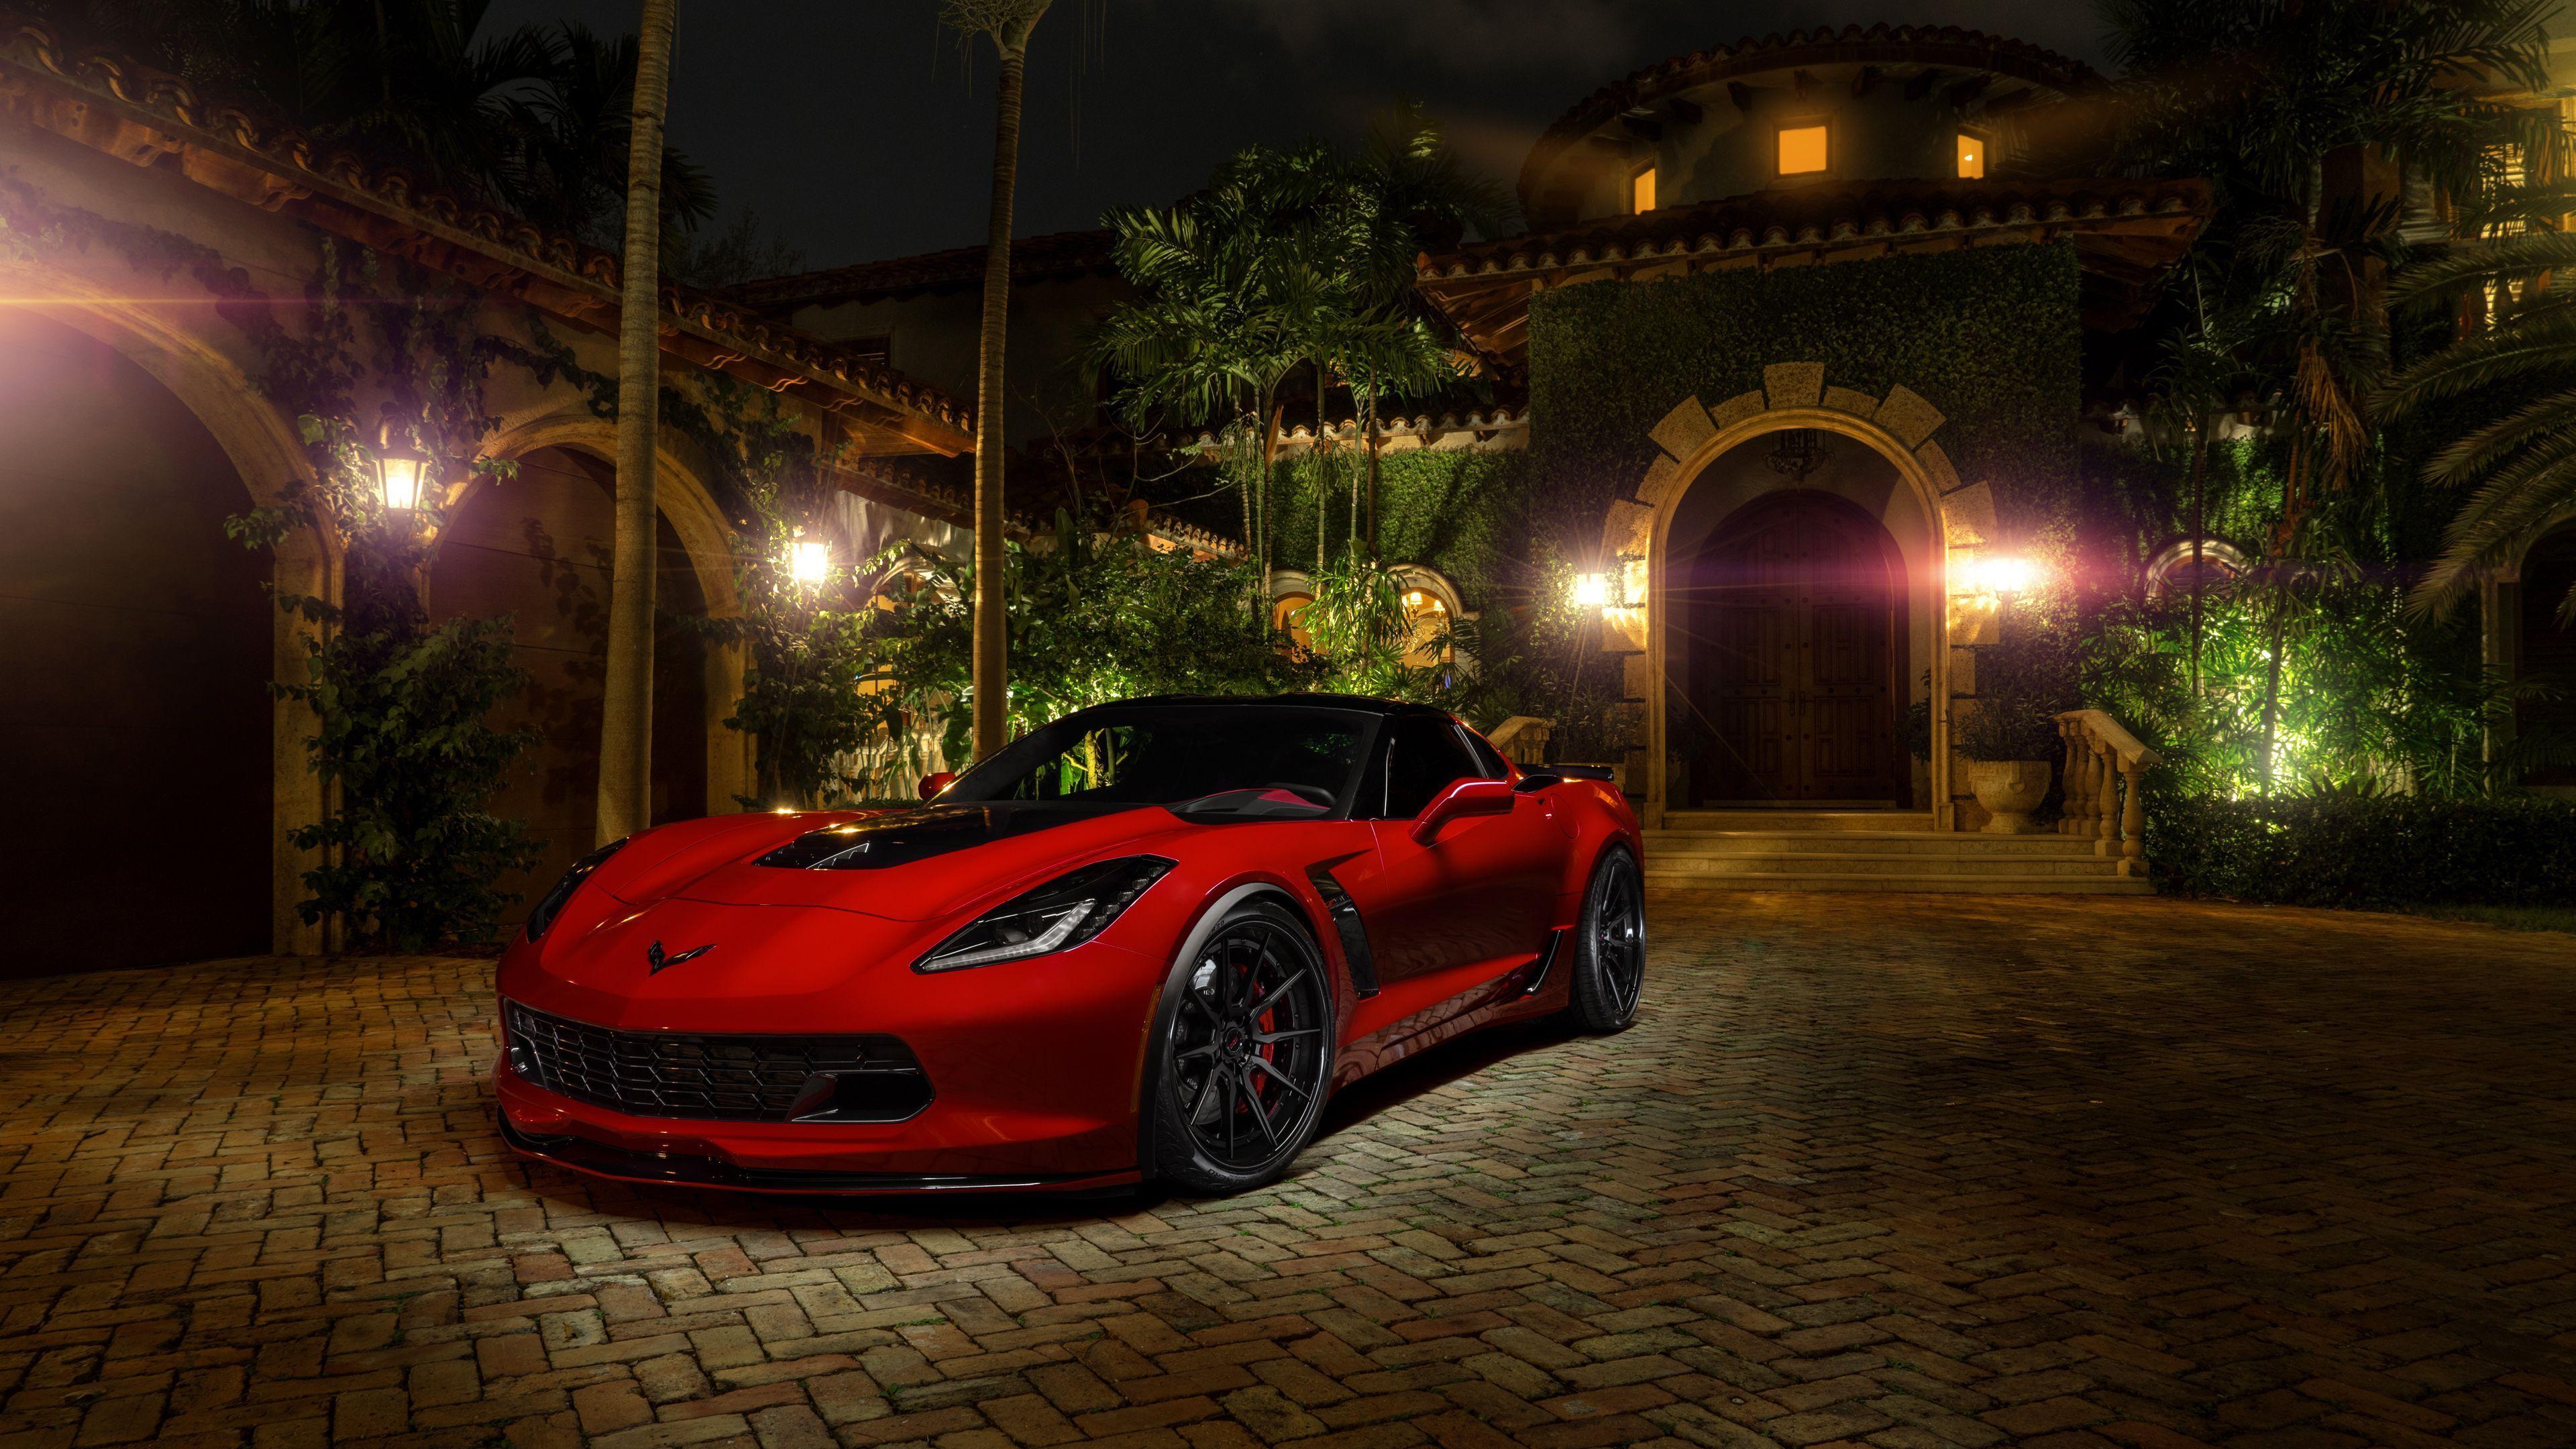 Corvette 2017 wallpapers hd wallpaper cave - Corvette wallpaper ...